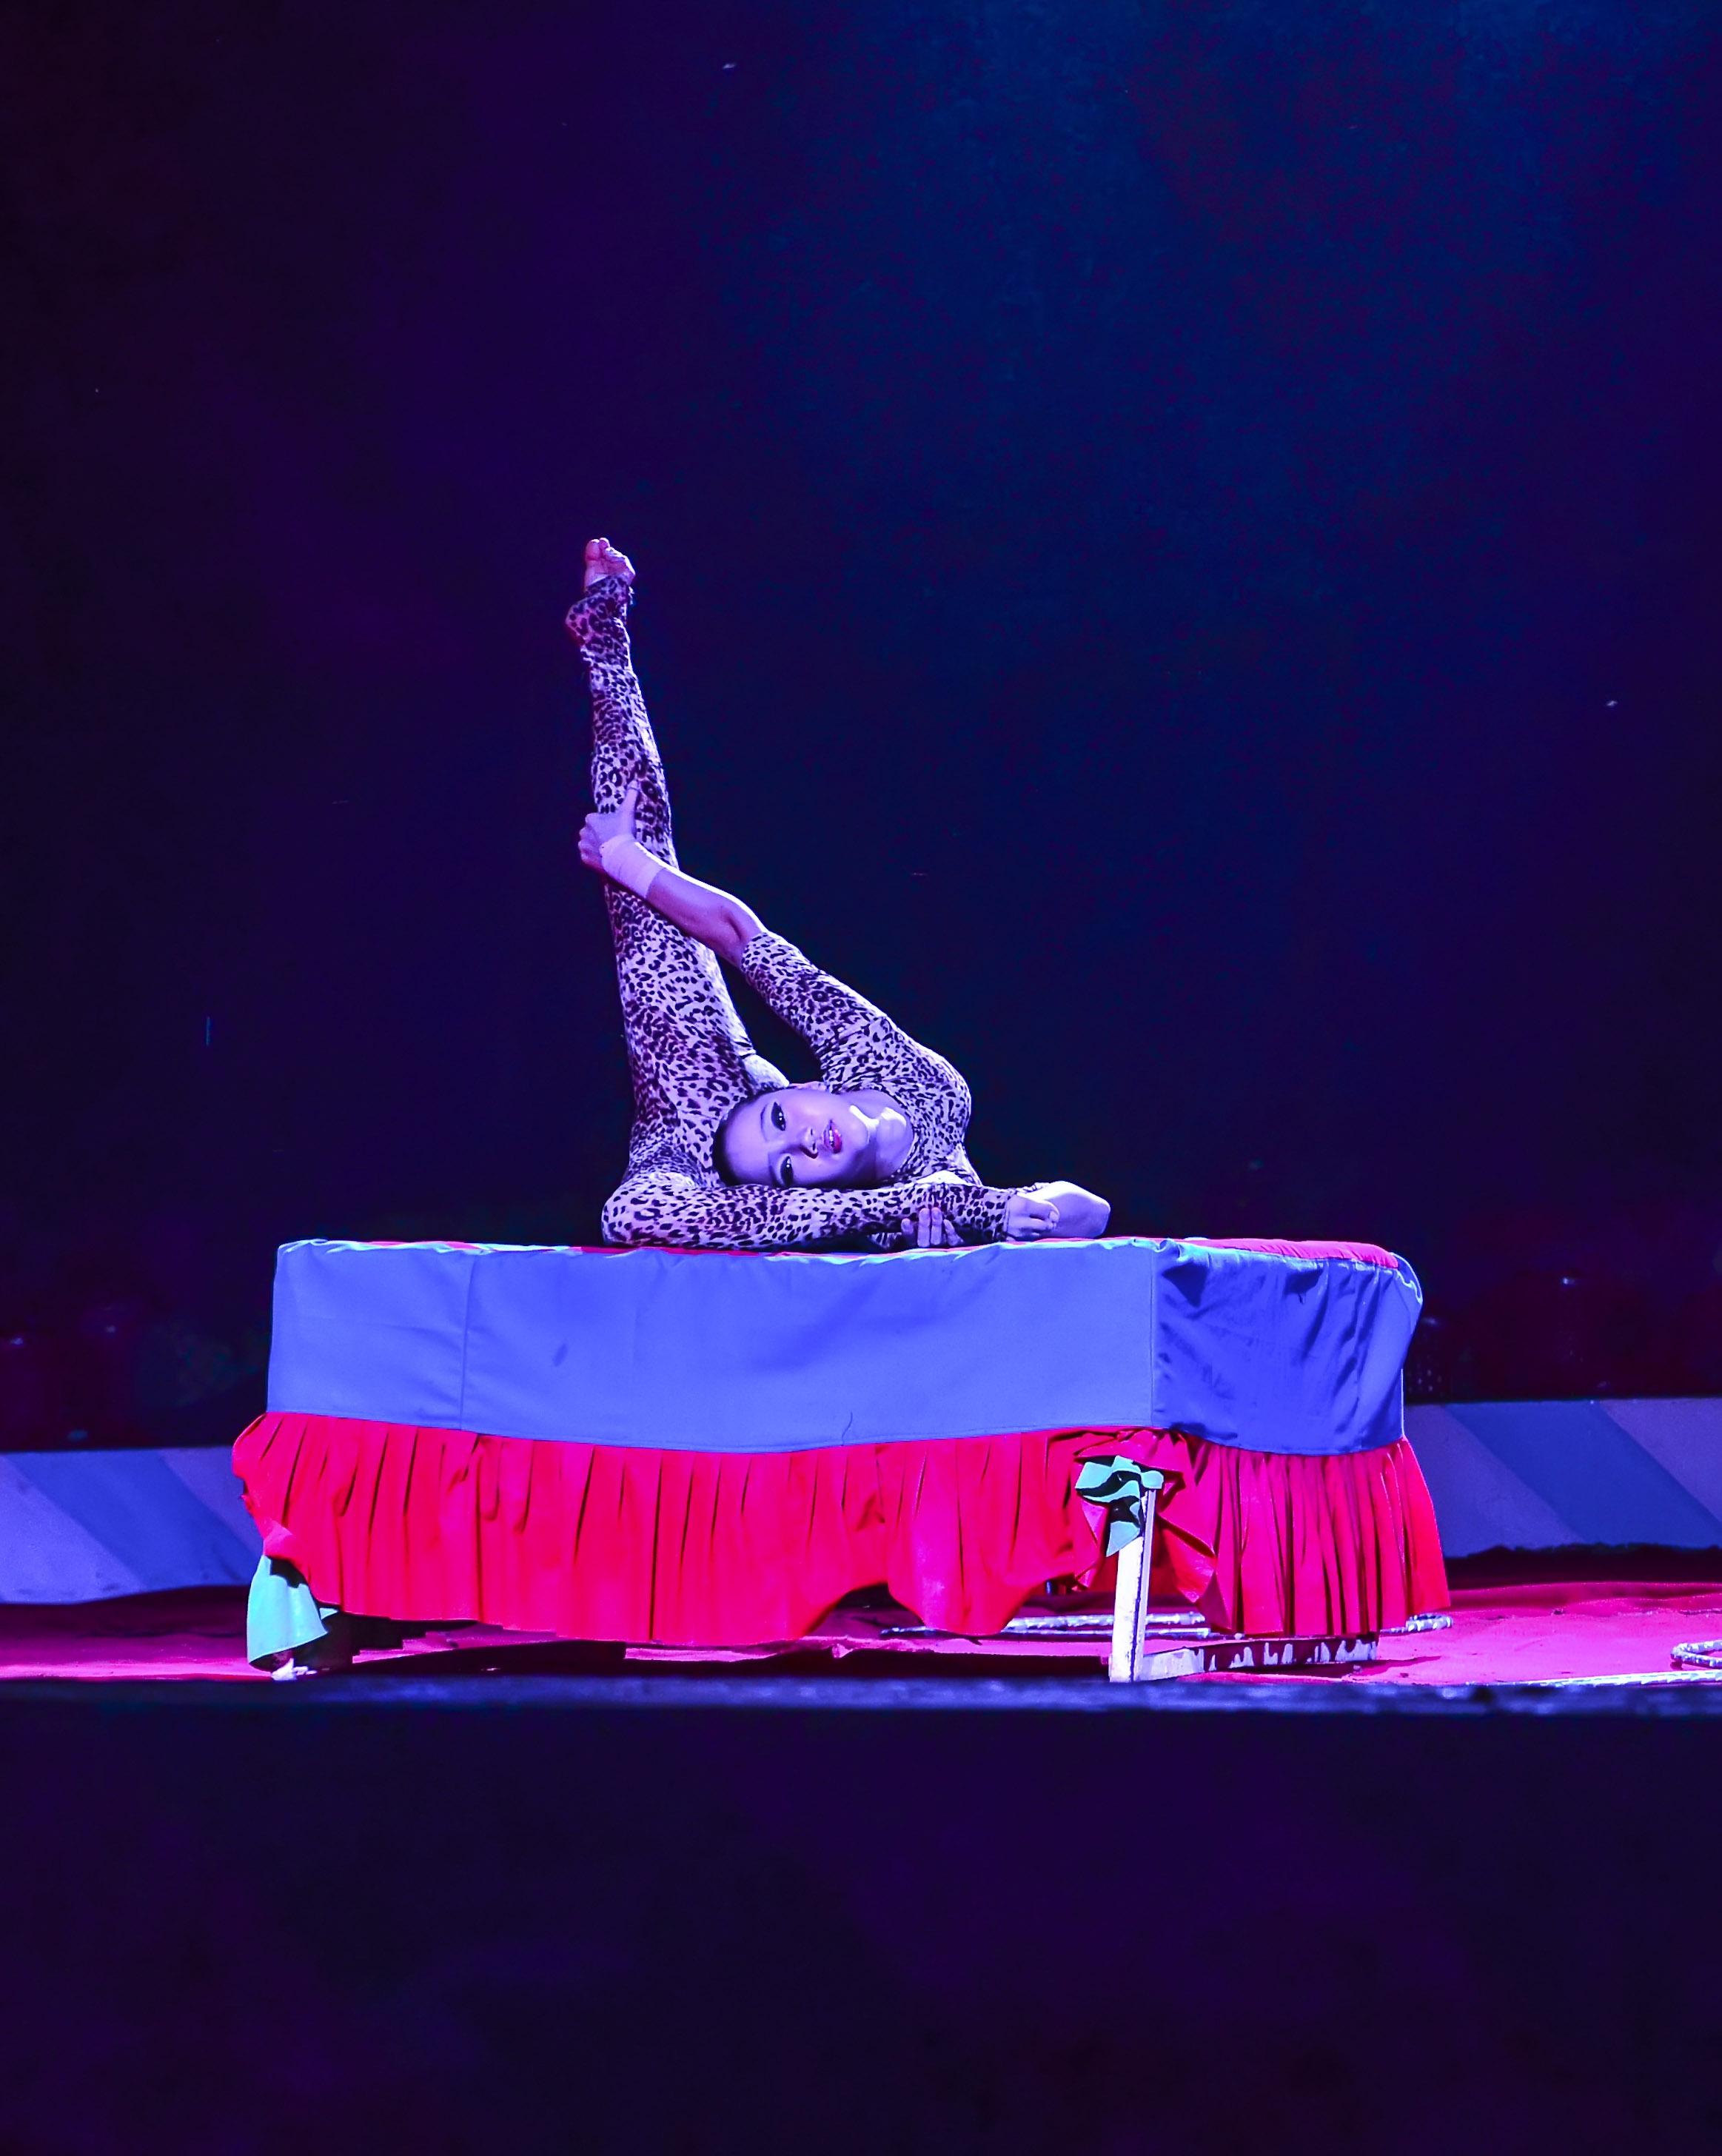 Circus acrobat photo